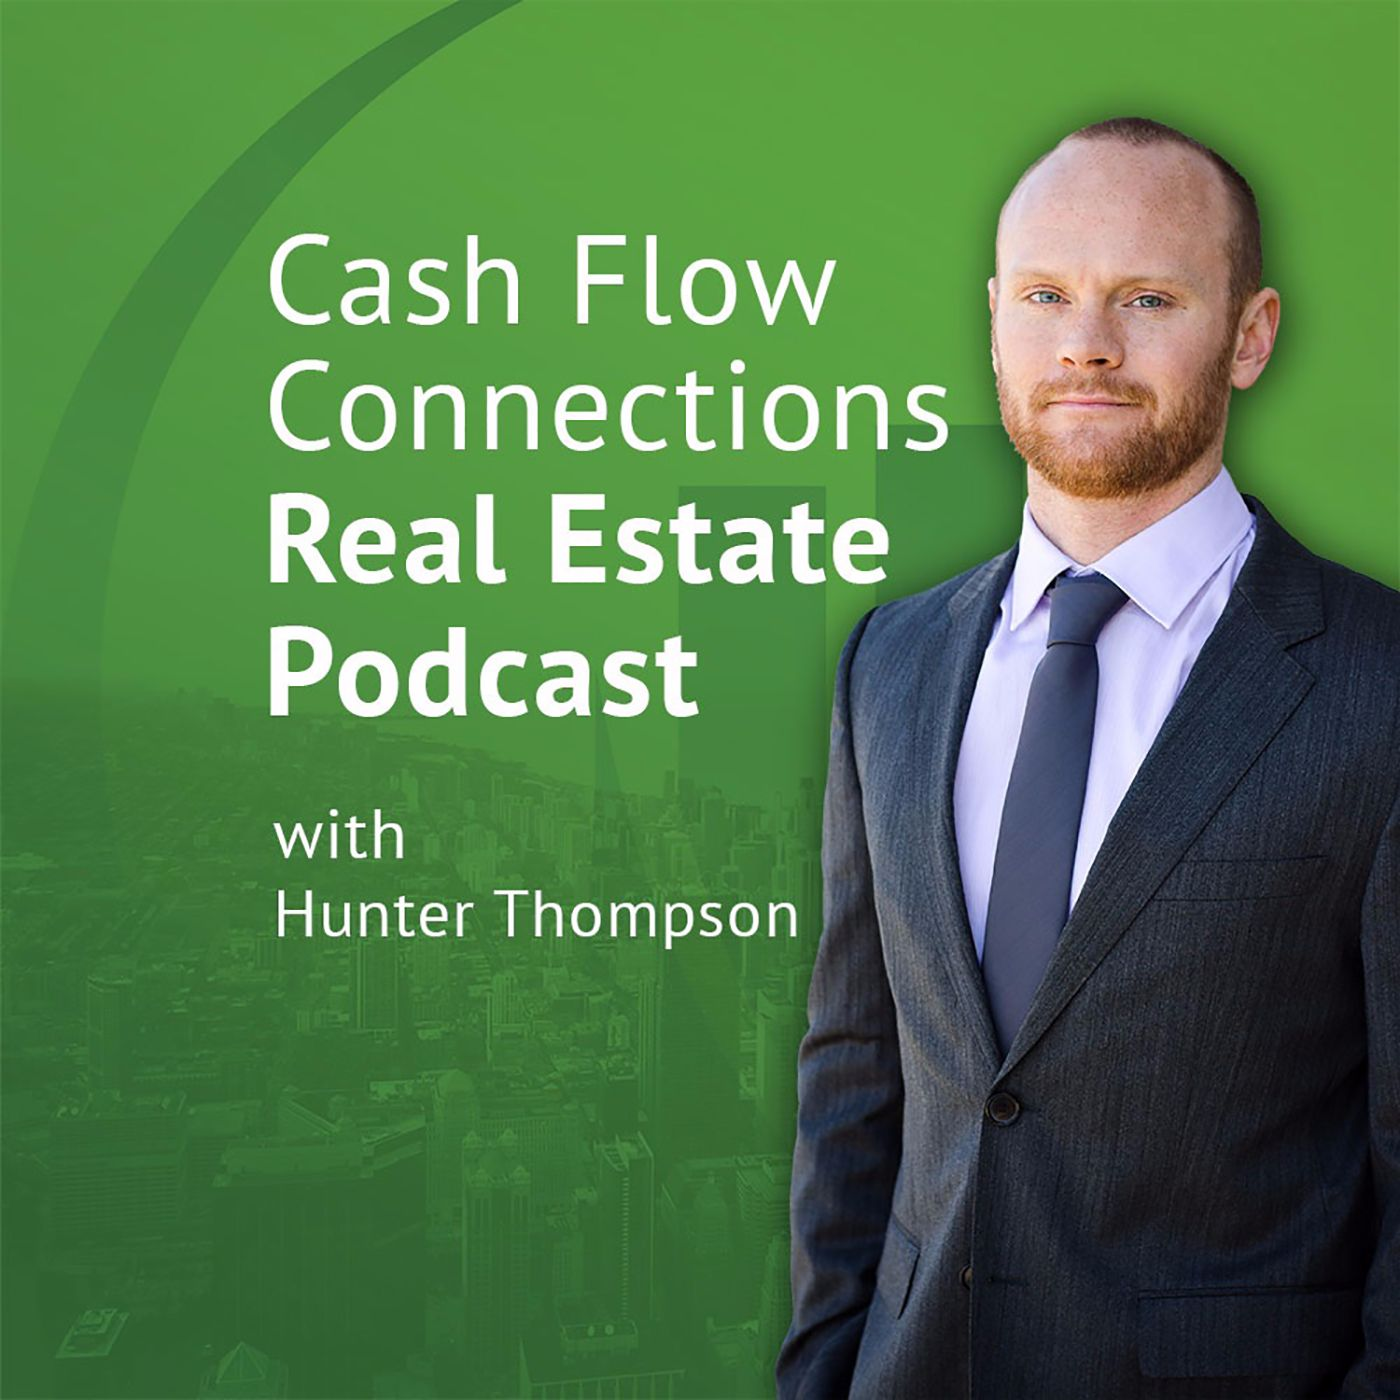 E153 - How to Attract Investors, Establish Credibility, and Fund Deals show art